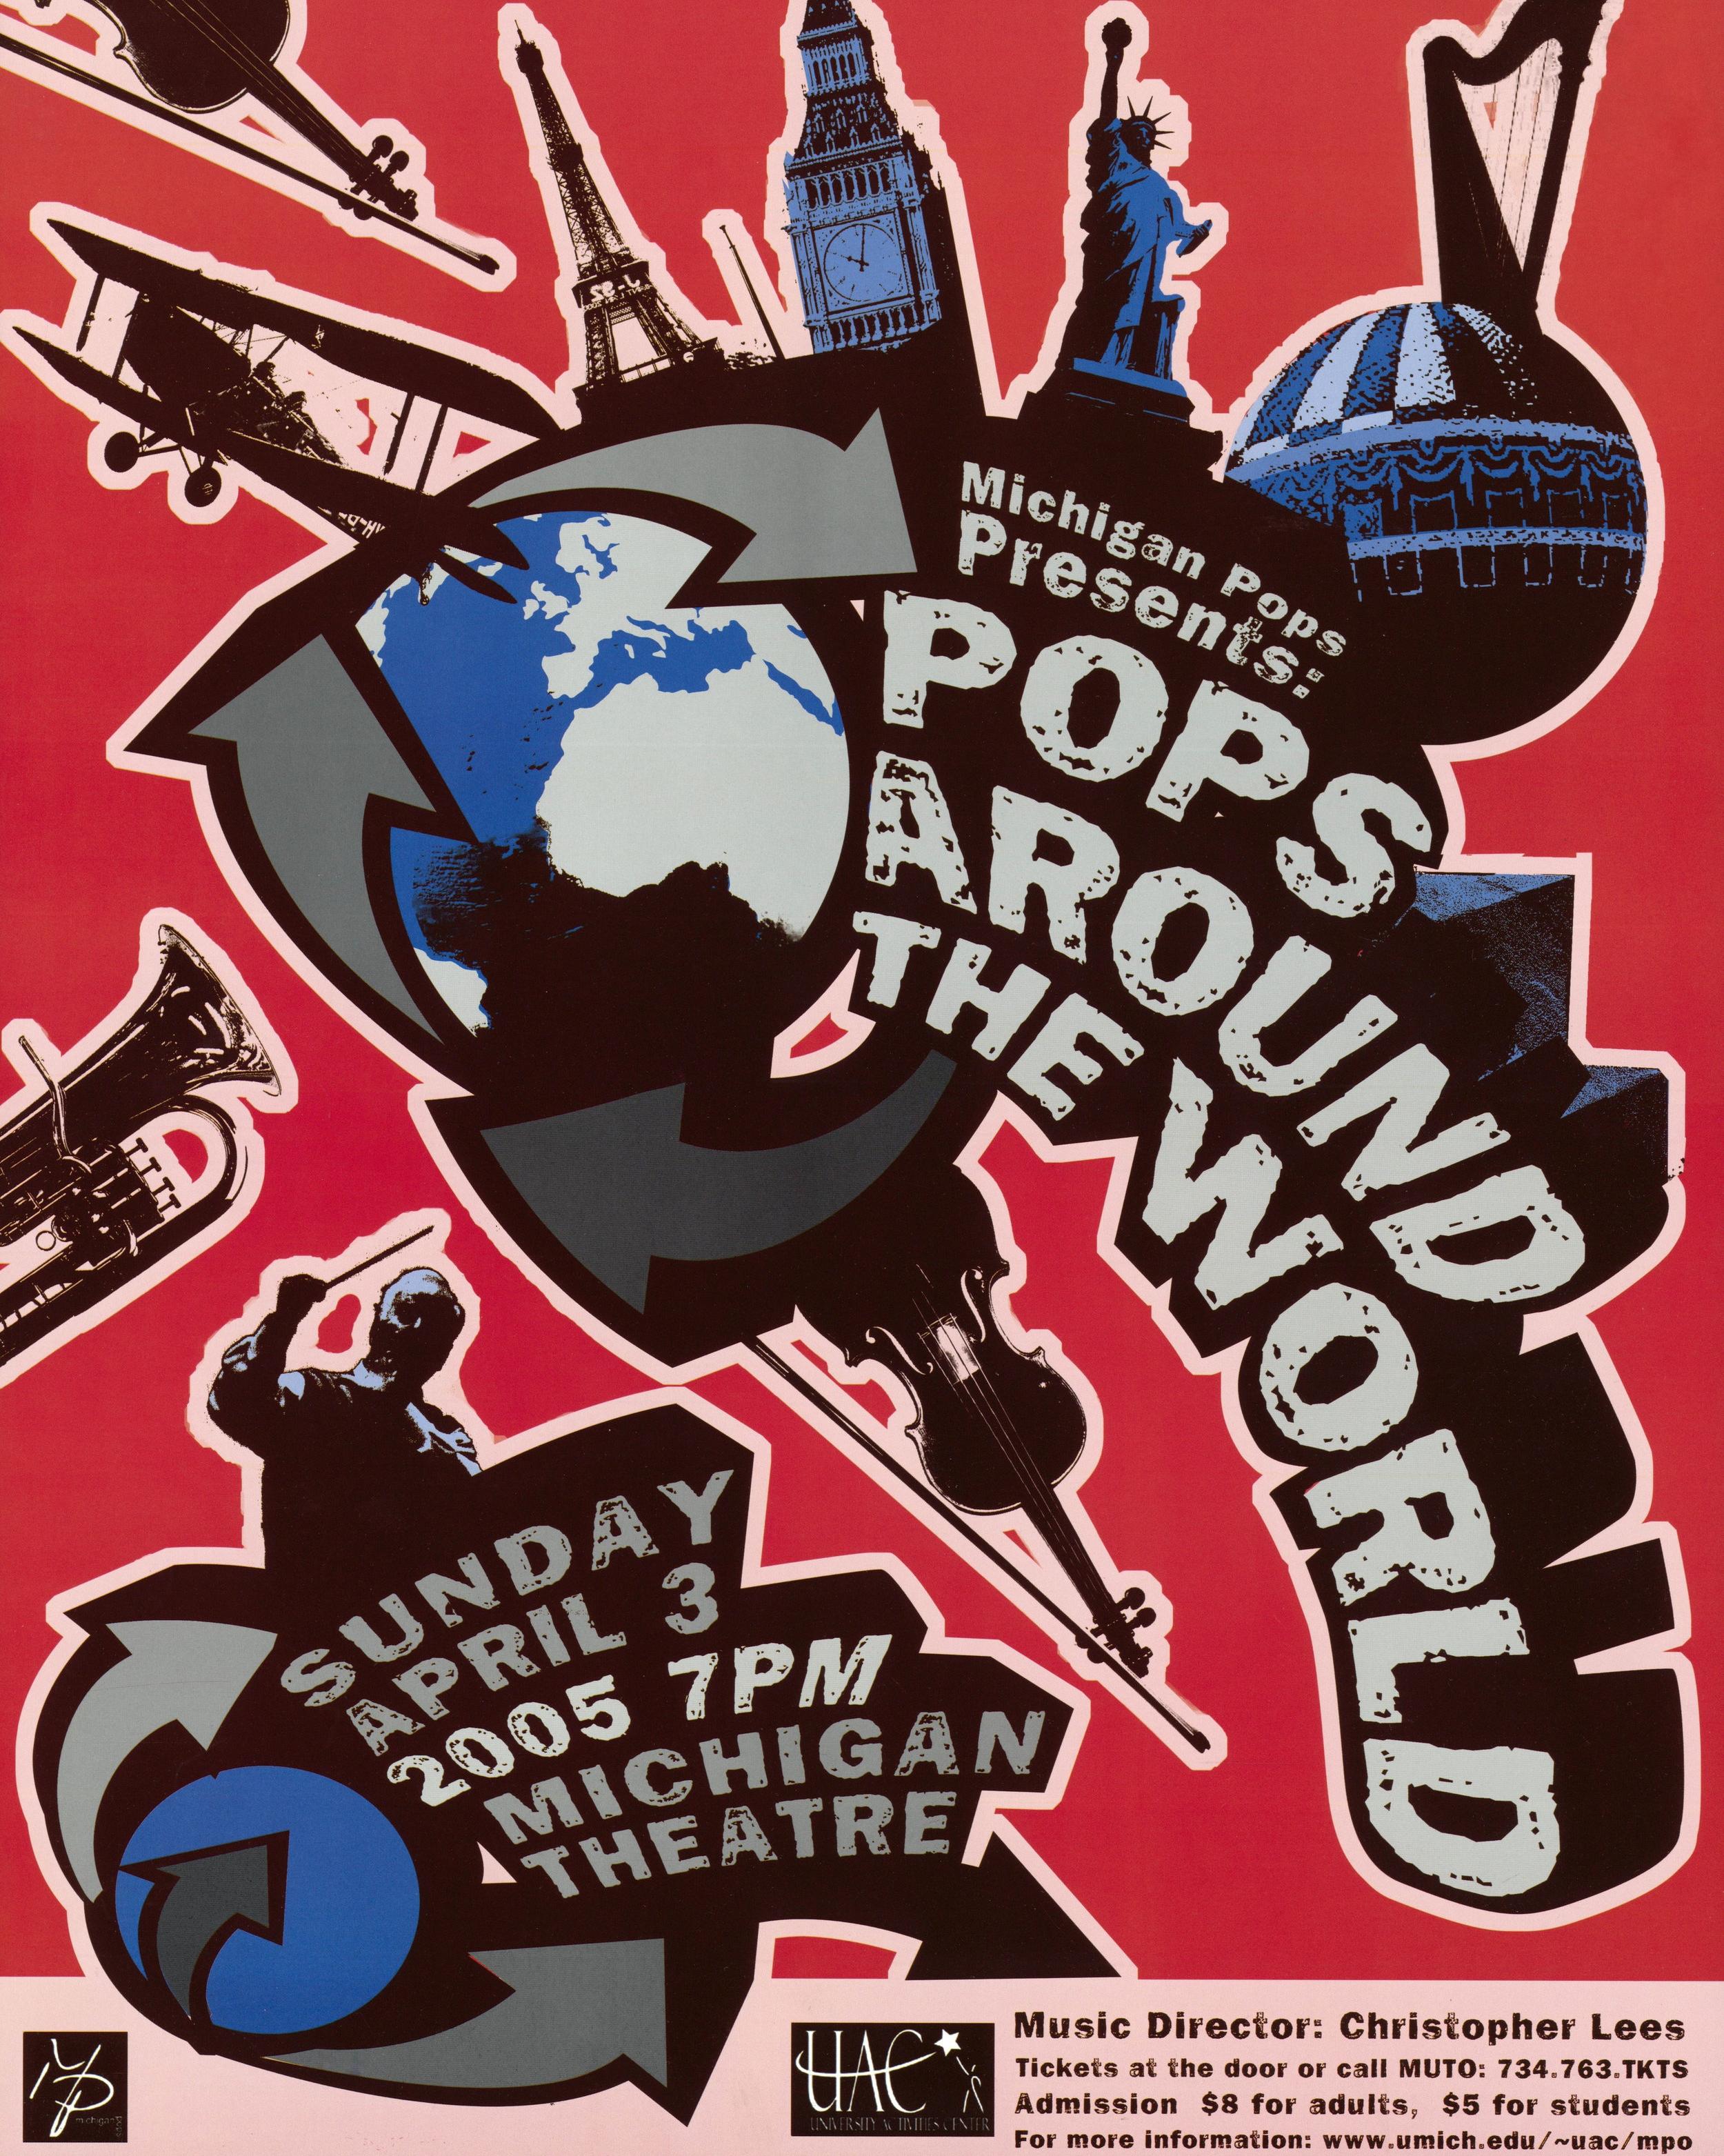 POPS AROUND THE WORLD  April 3, 2005